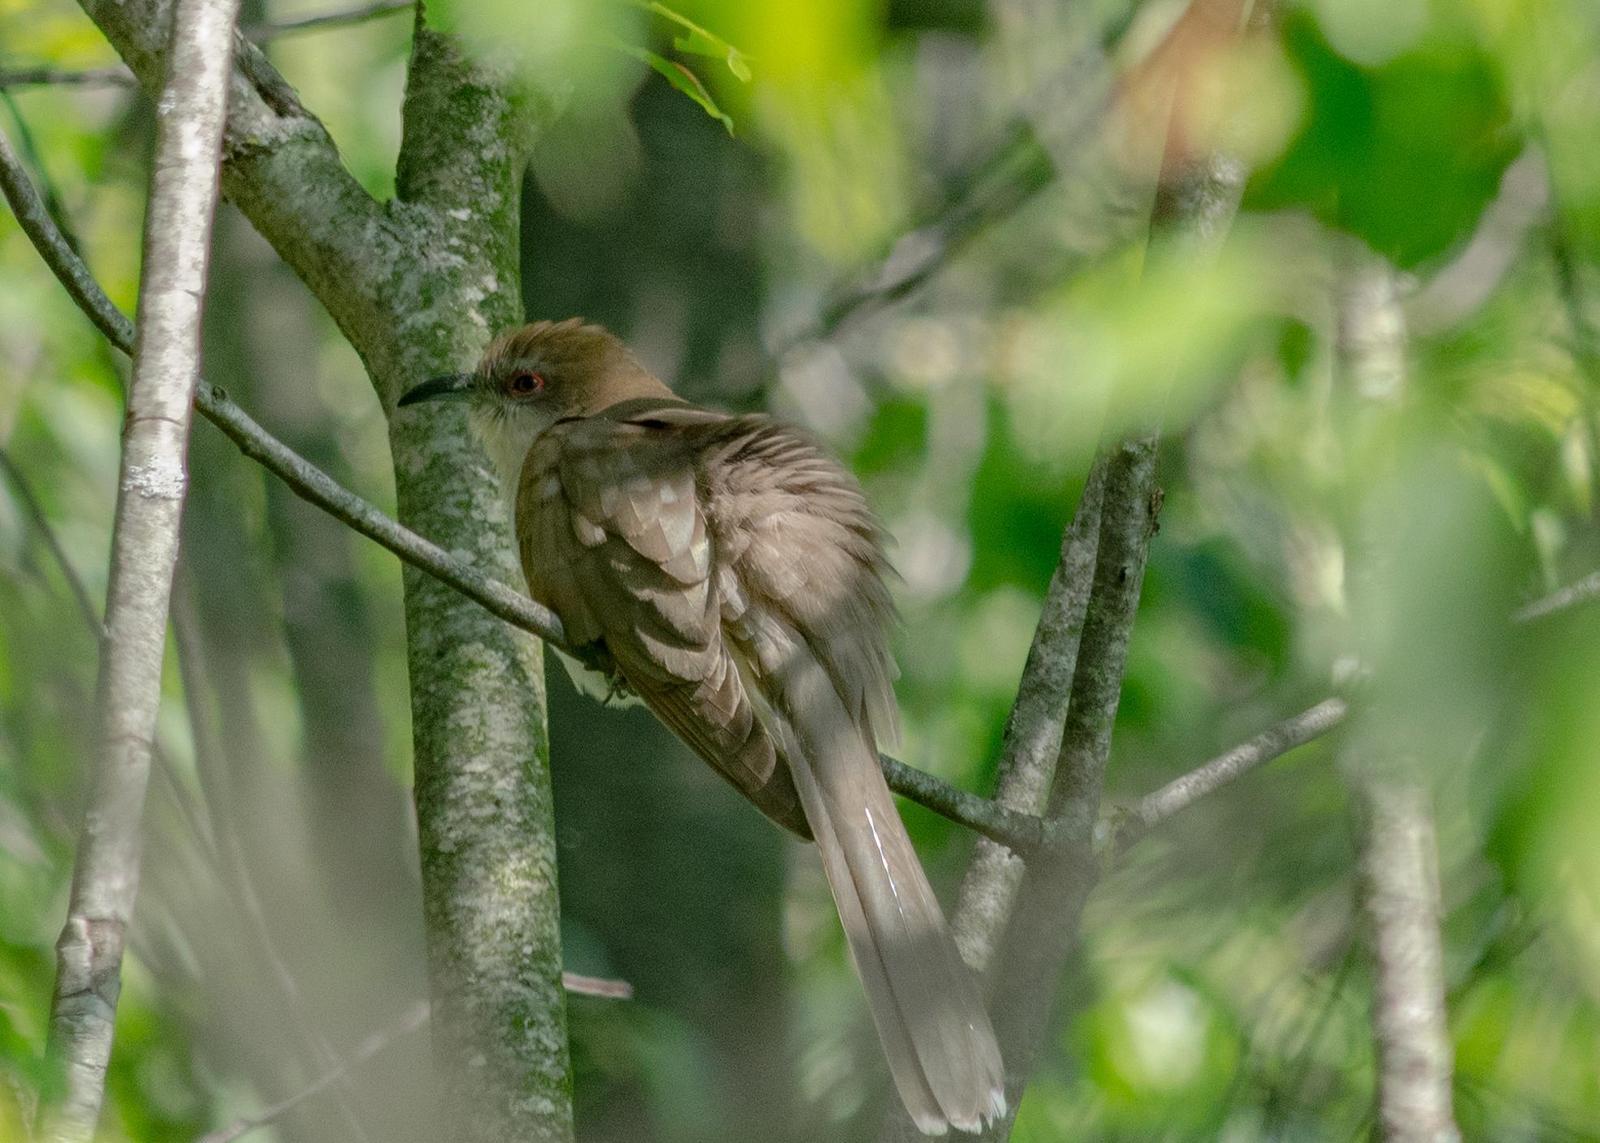 Black-billed Cuckoo Photo by Keshava Mysore